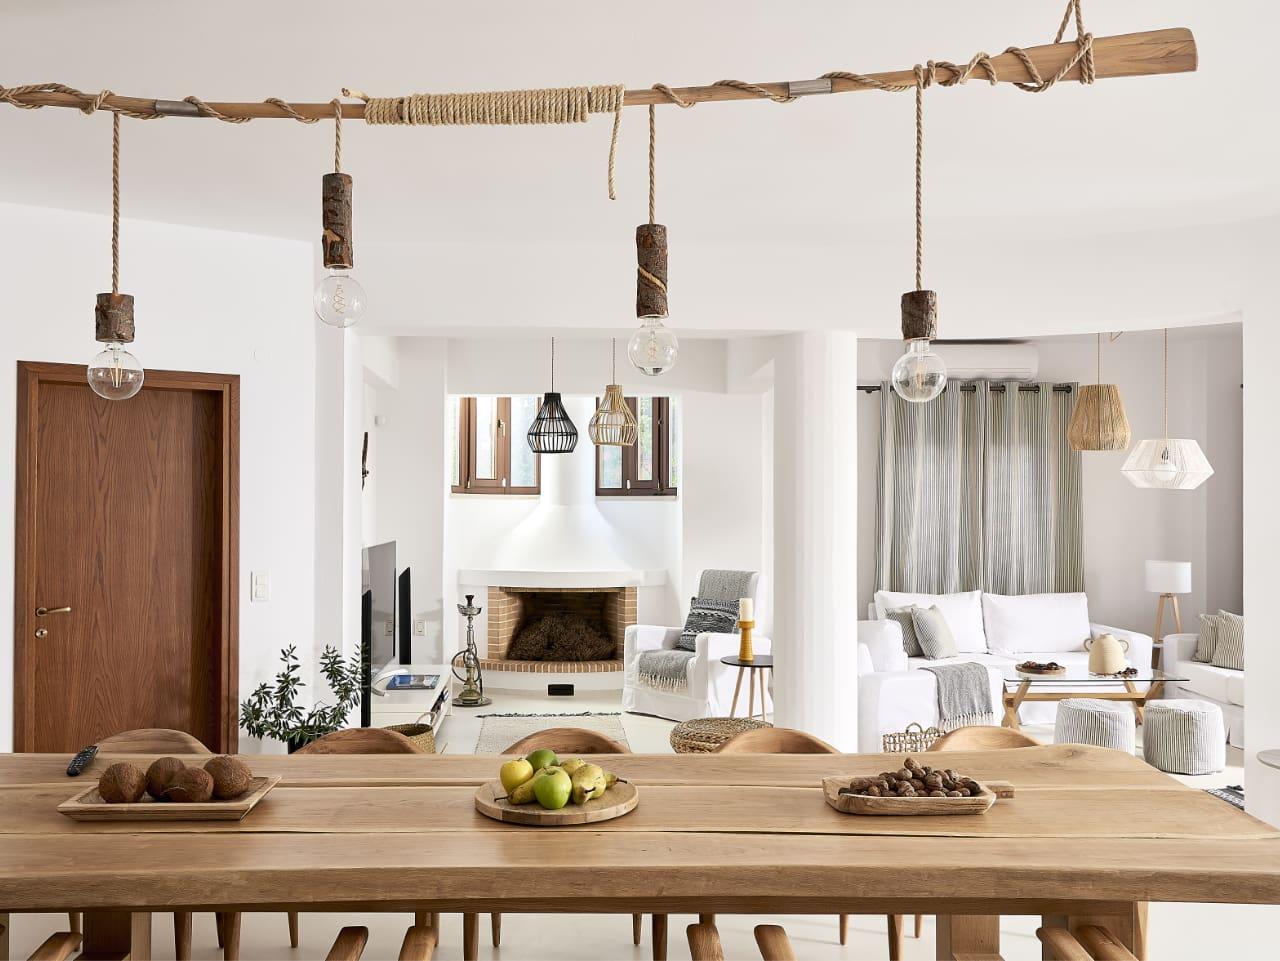 Villa Margarita Episkopi Crete - Your Family Villa In Crete